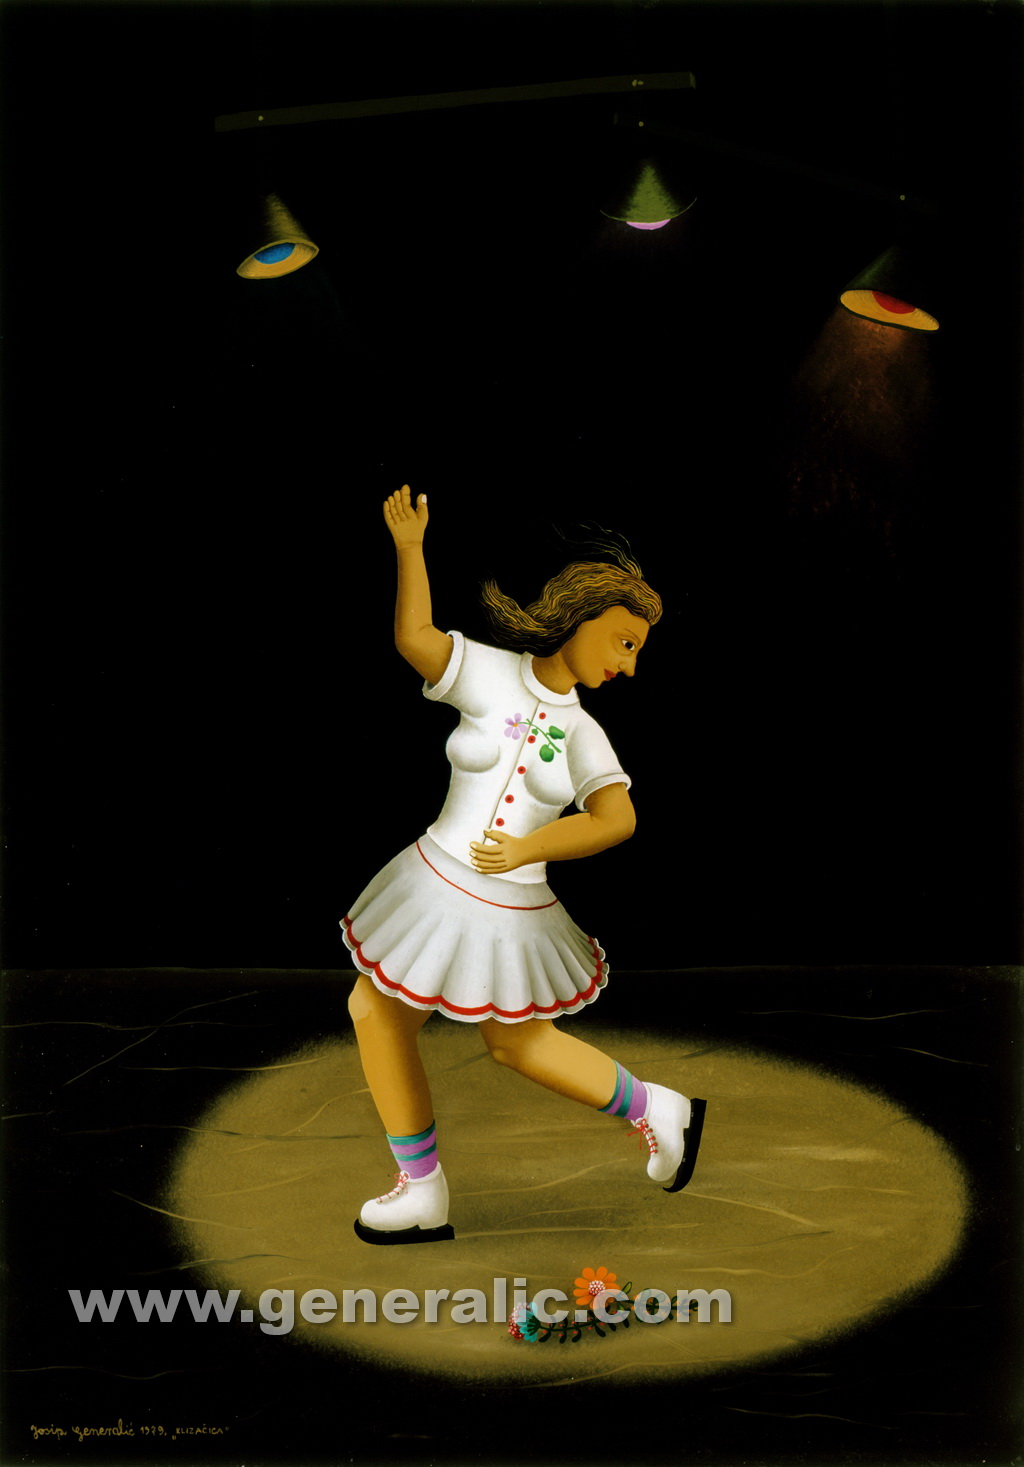 Josip Generalic, 1979, Skaterwoman, oil on glass, 70x90 cm